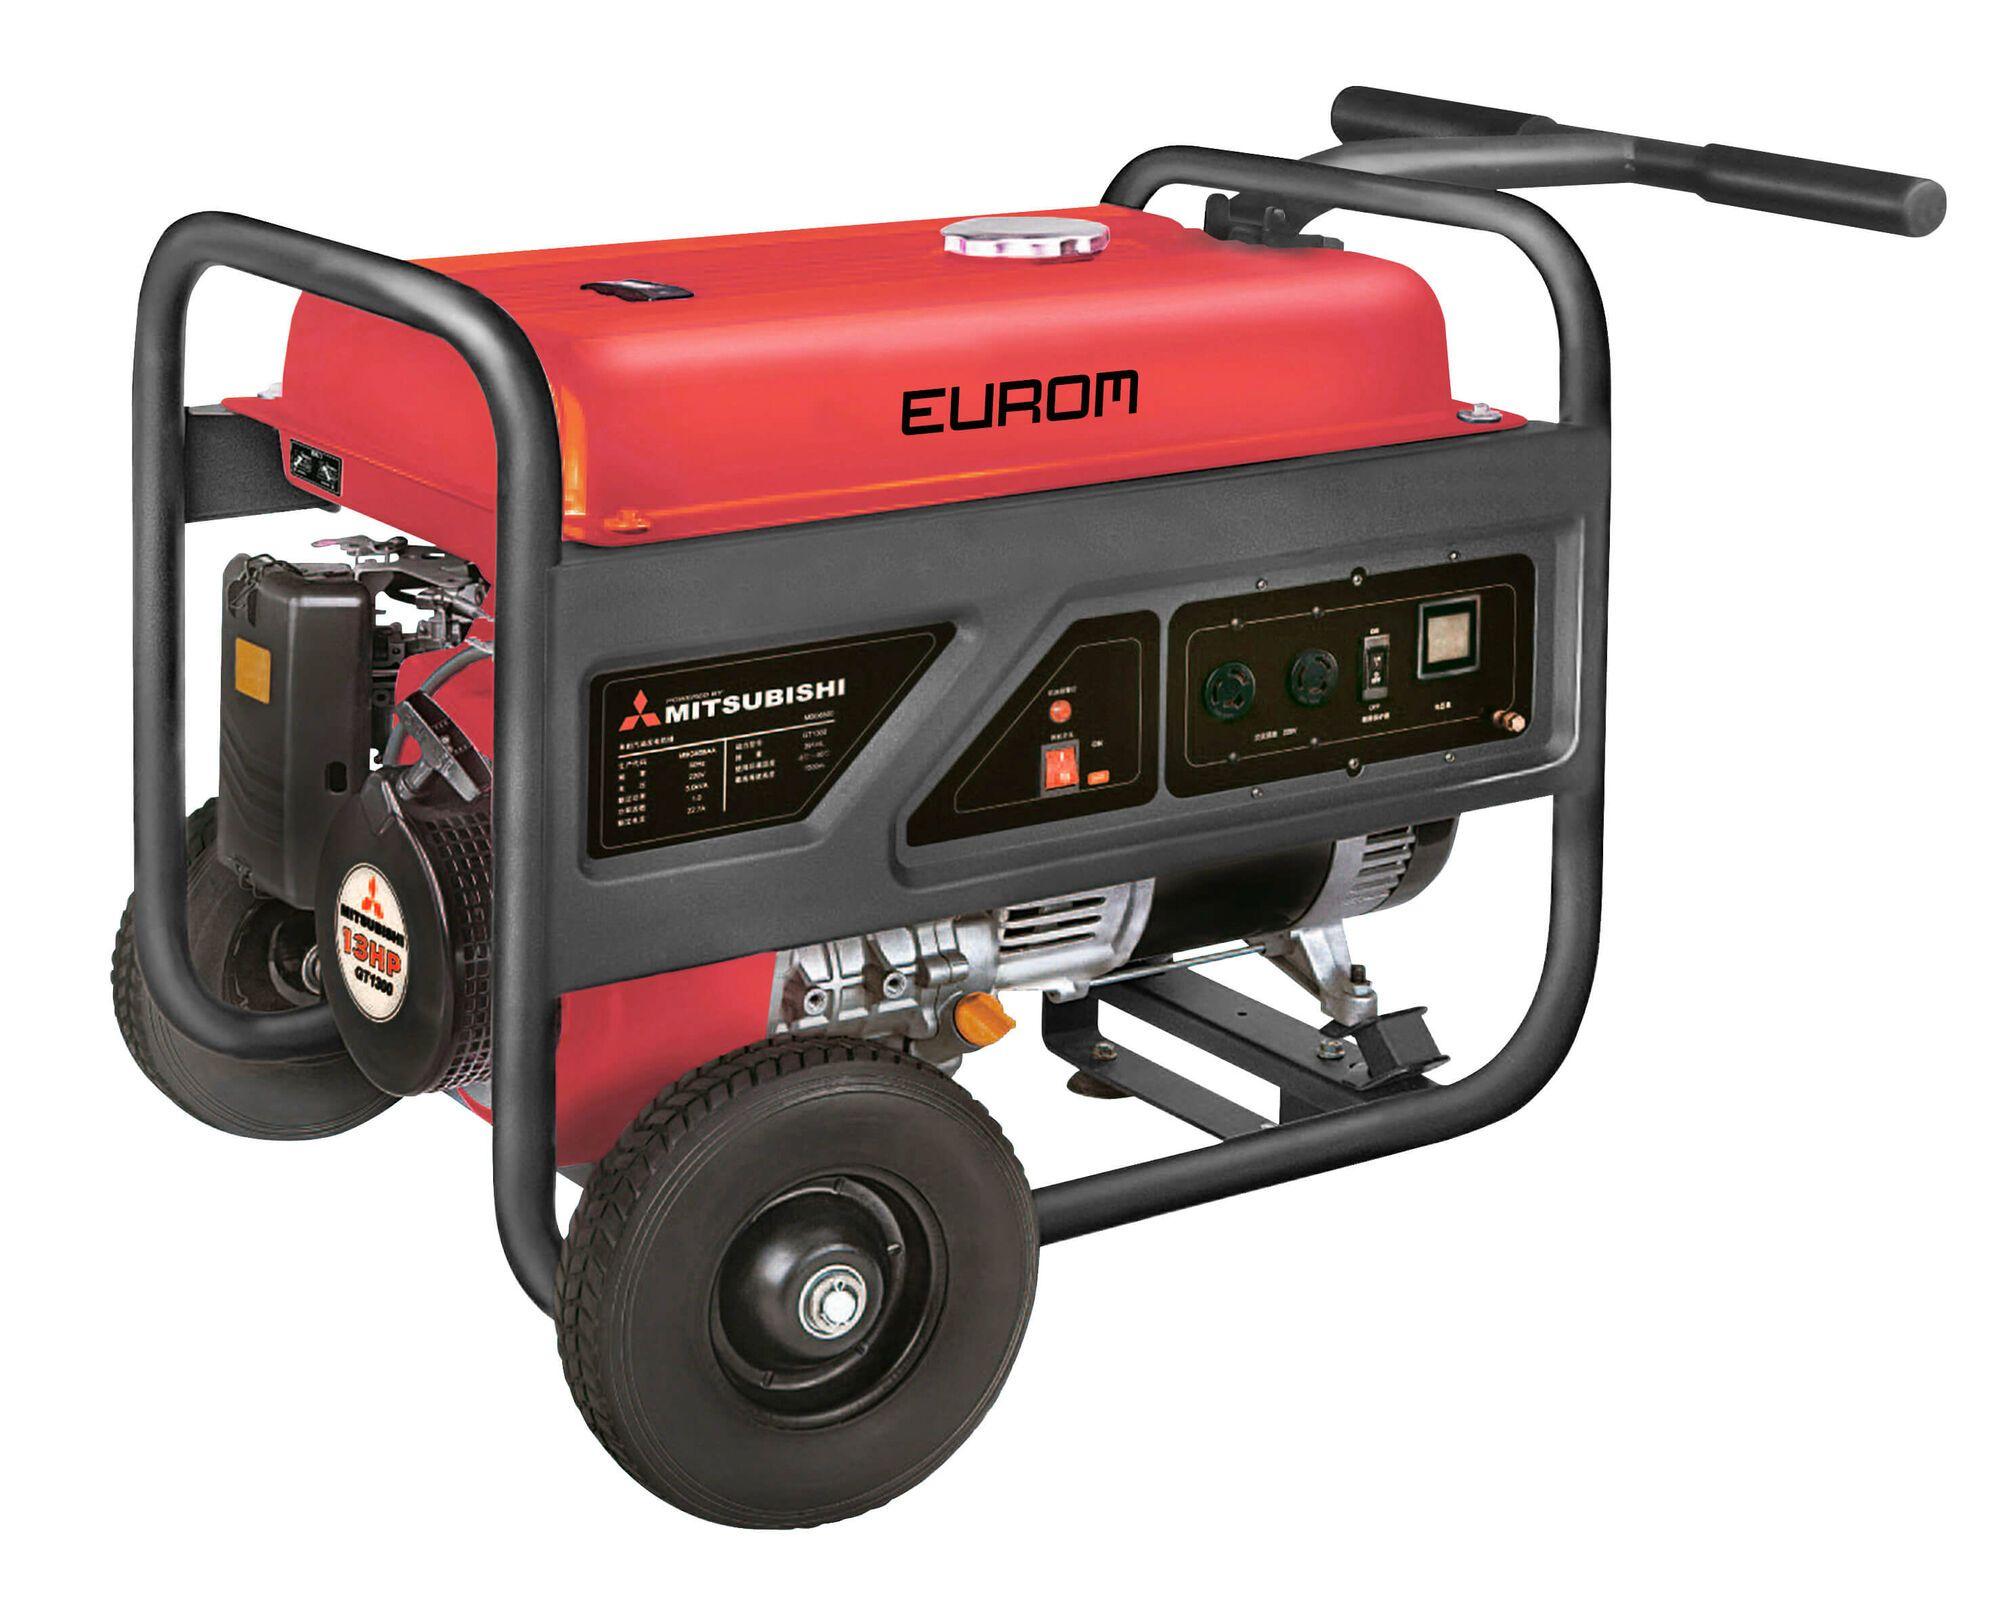 Eurom MM6500 Benzine generator 4.400W | Aggregaat 5,5 kVa Mitsubishi motor 230V